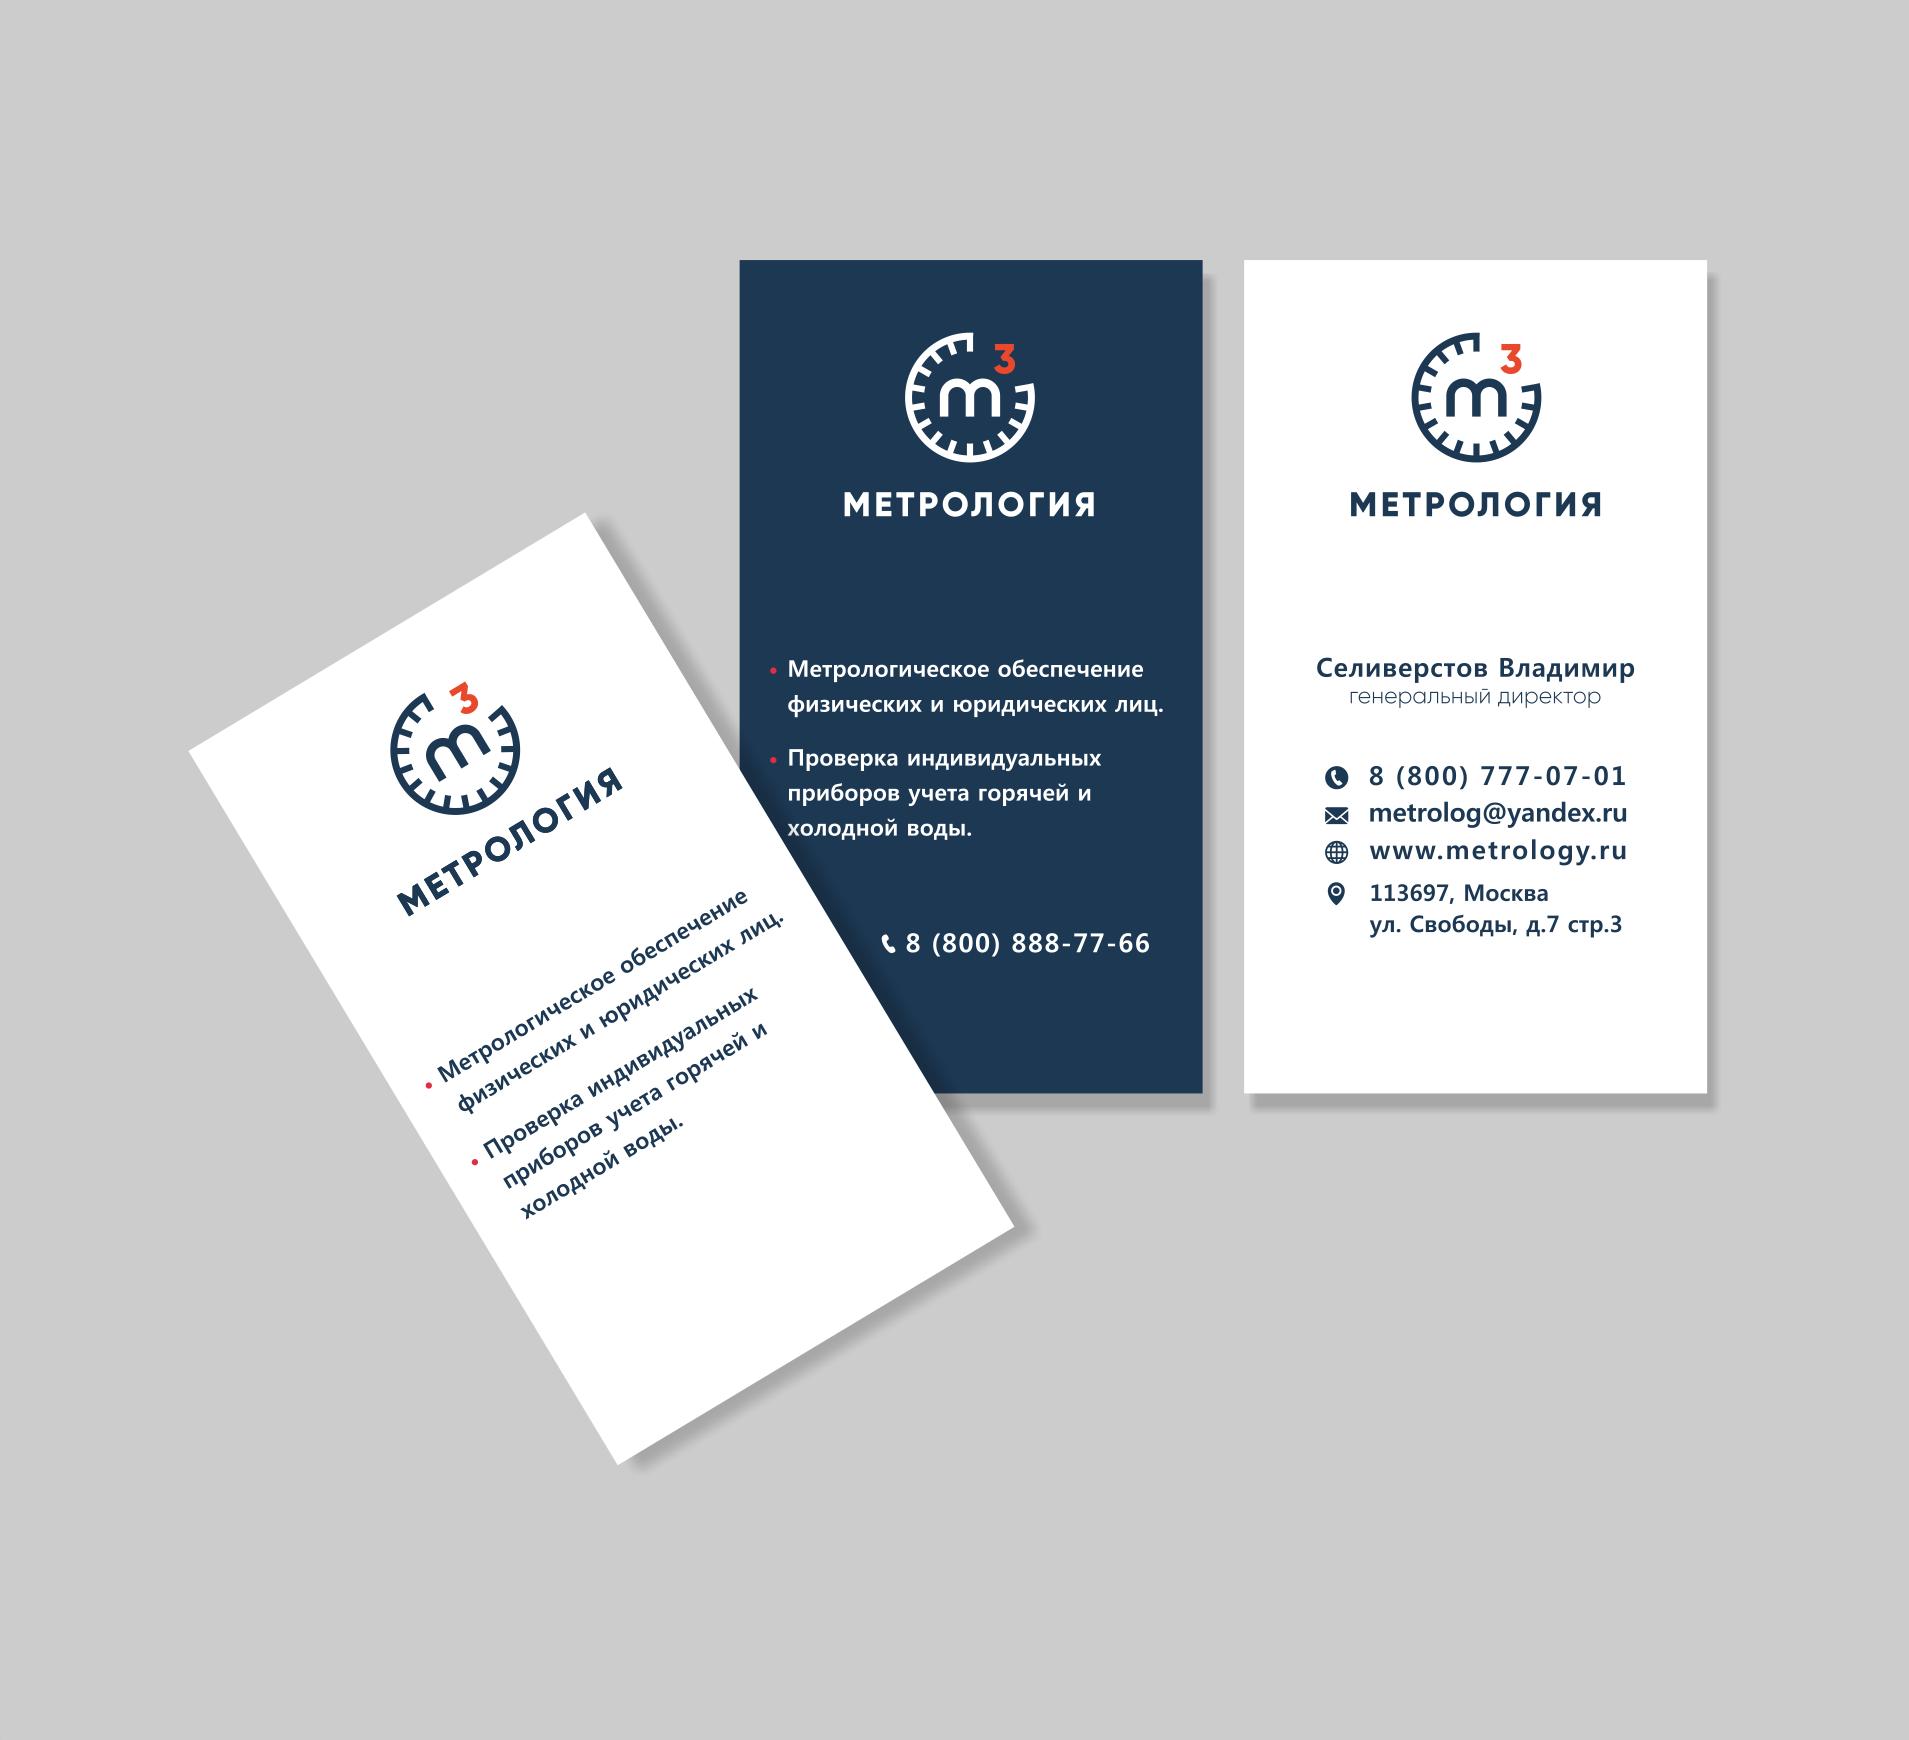 Разработать логотип, визитку, фирменный бланк. фото f_77258f7fab63881b.png